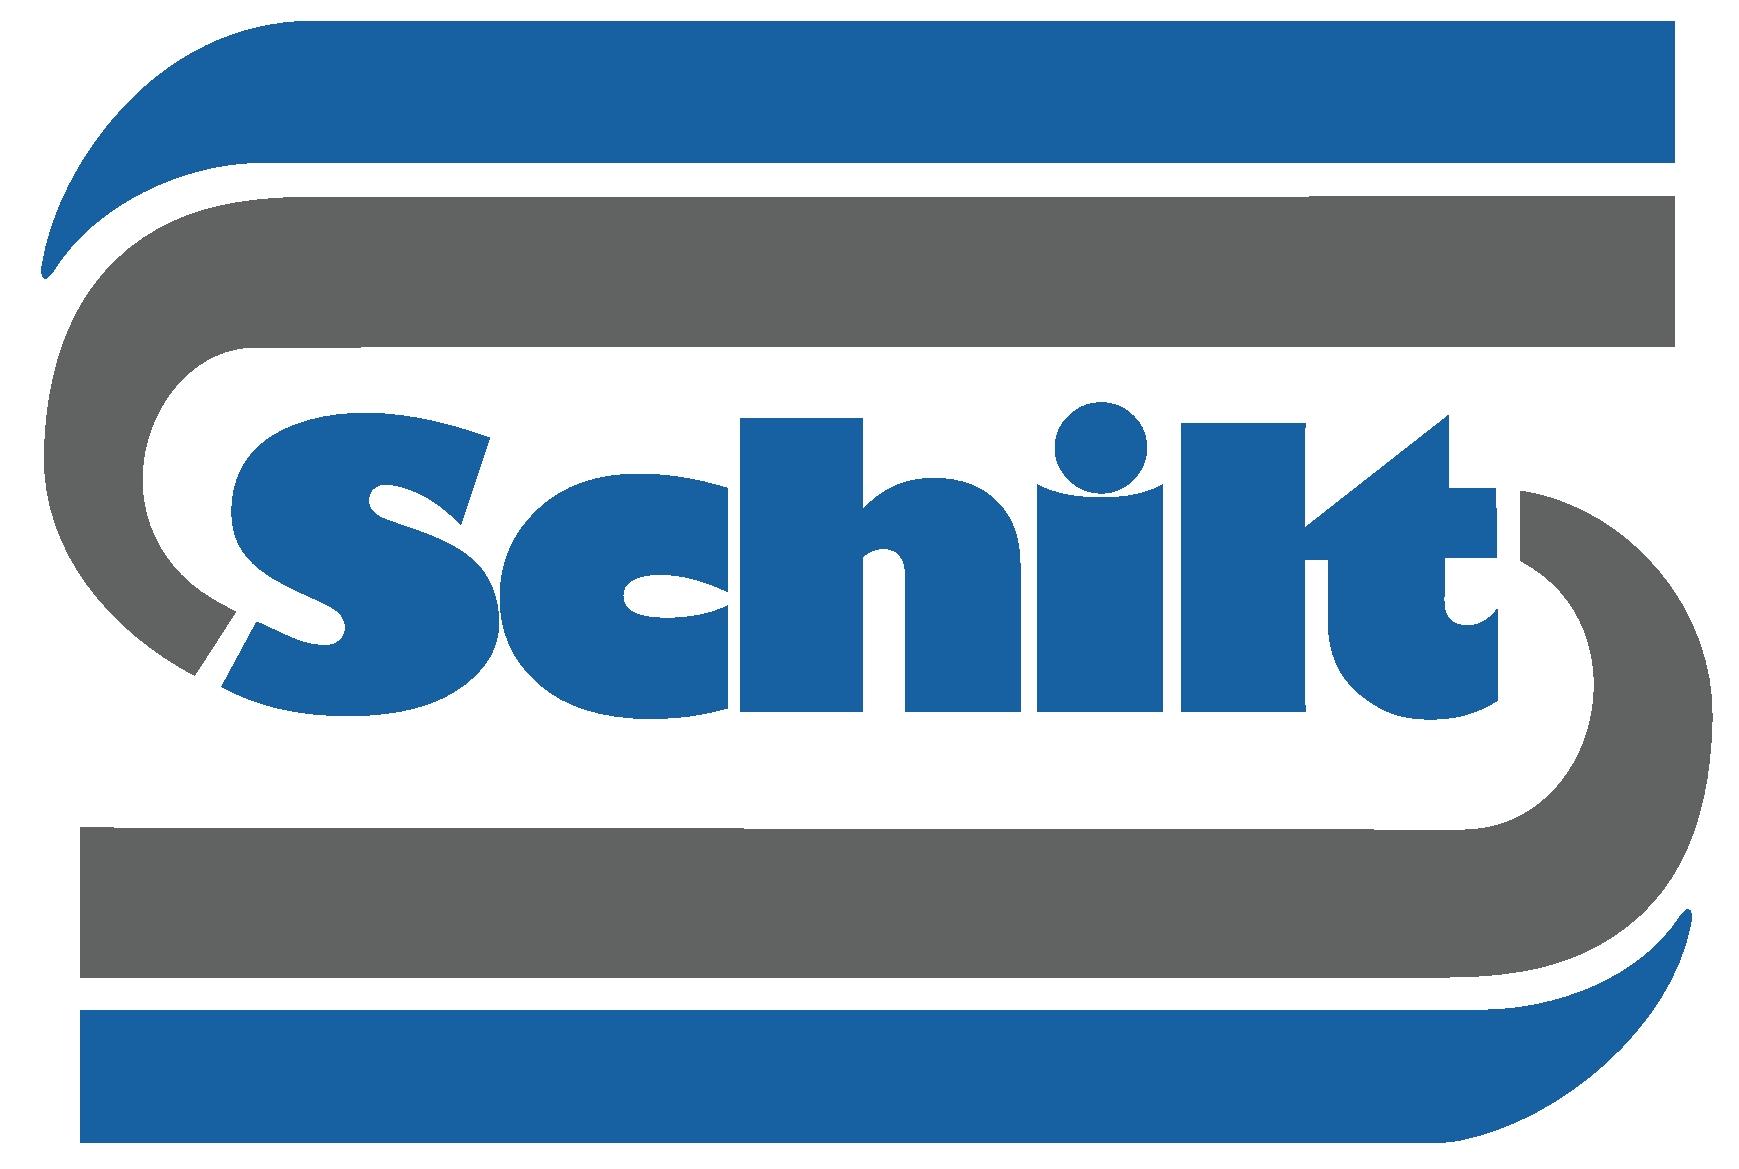 Schilt